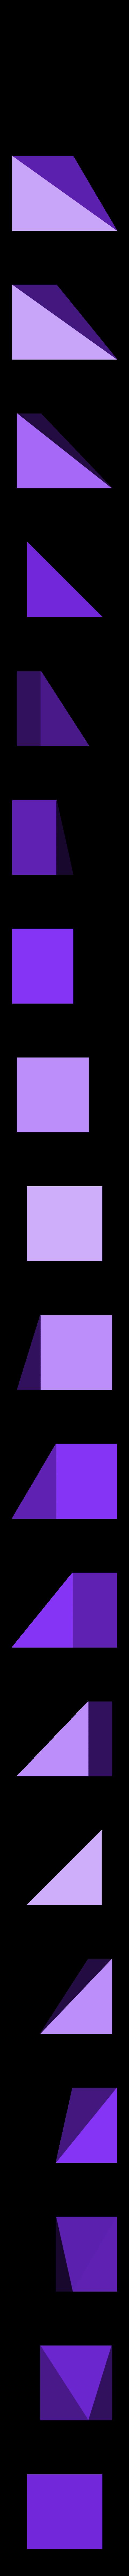 LiuHuiThird_VerD.stl Download free STL file Thirds Cube Dissection, Many Styles, Liu Hui • 3D printer template, LGBU